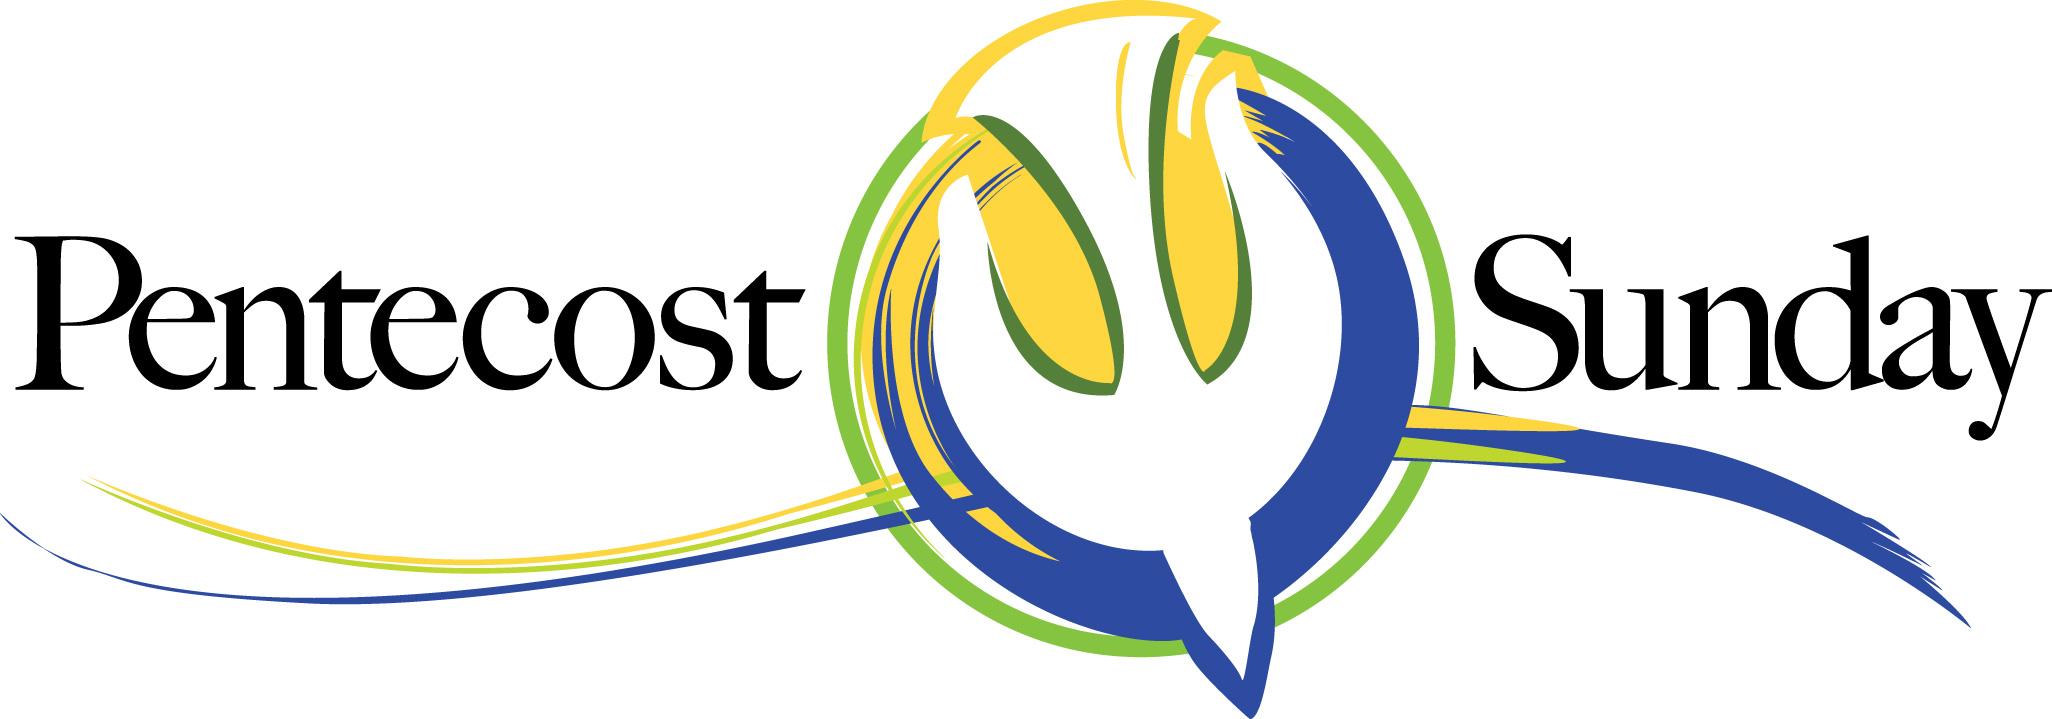 2052x719 Pentecost Sunday Clipart